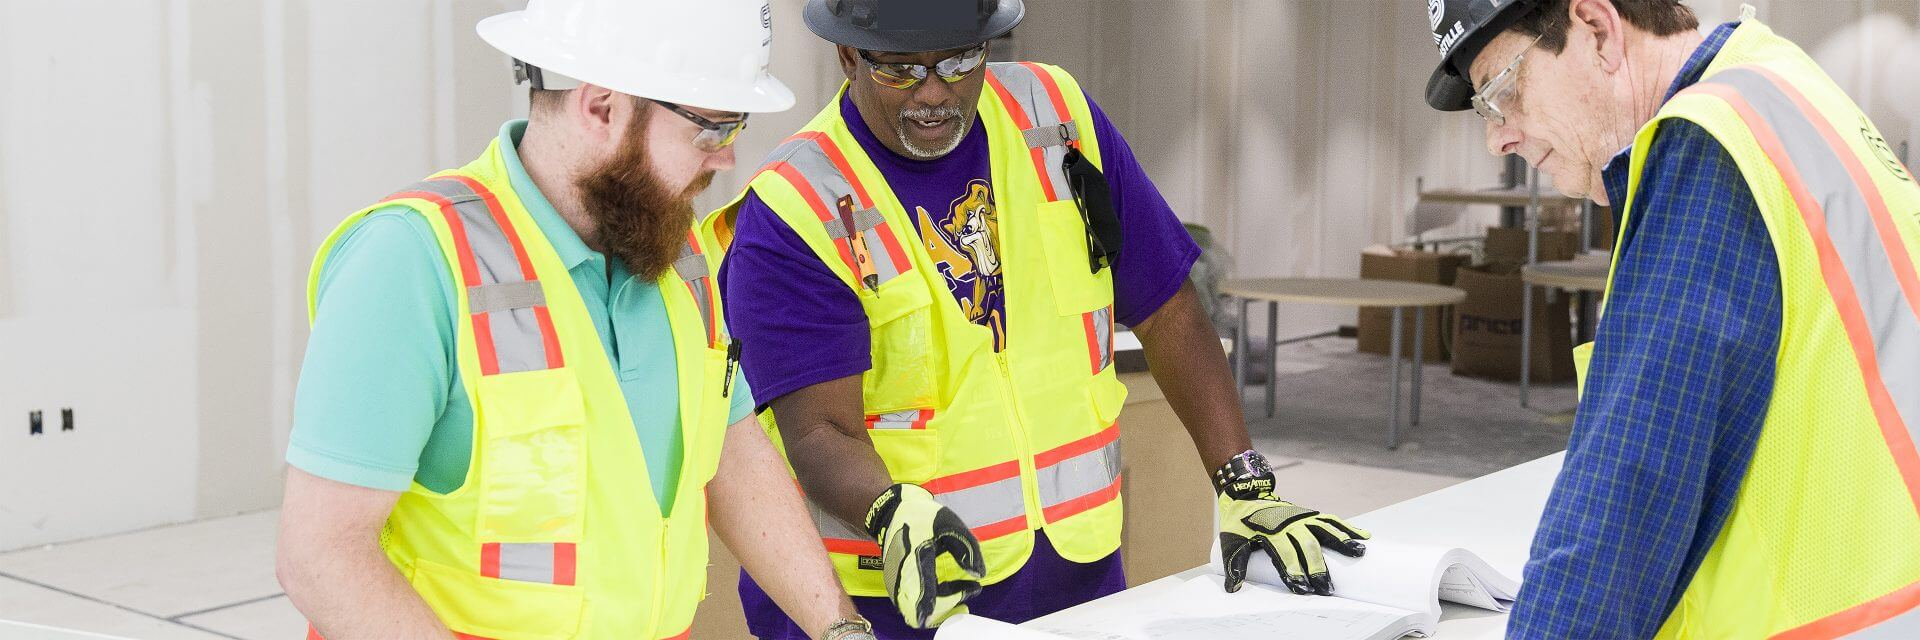 ONEsolution approach ensured project success despite hurricane